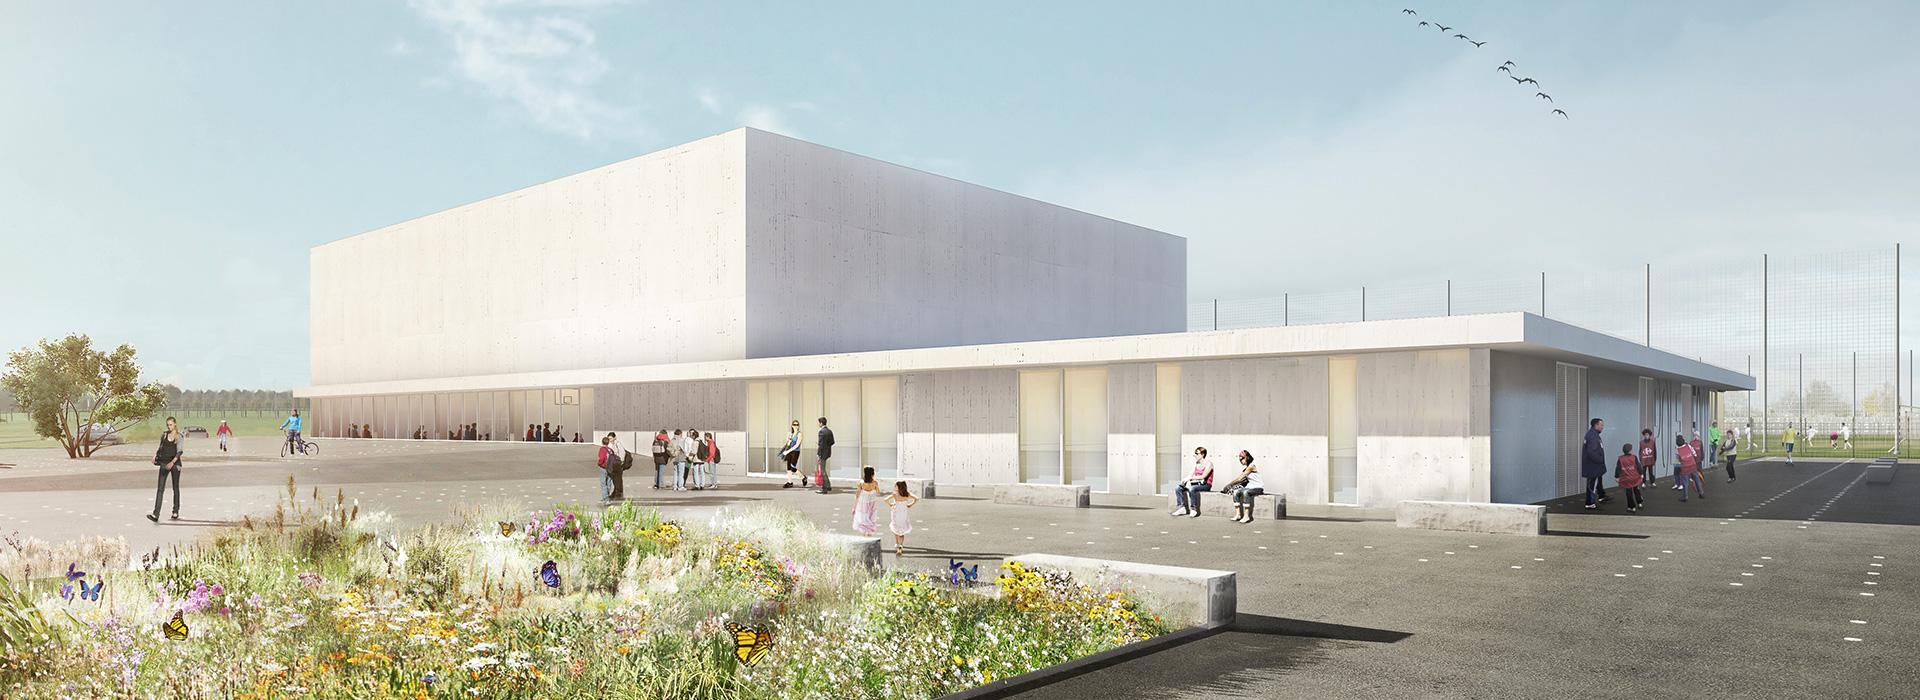 Salle omnisports de genech, delzua+ architectes, gec ingénierie